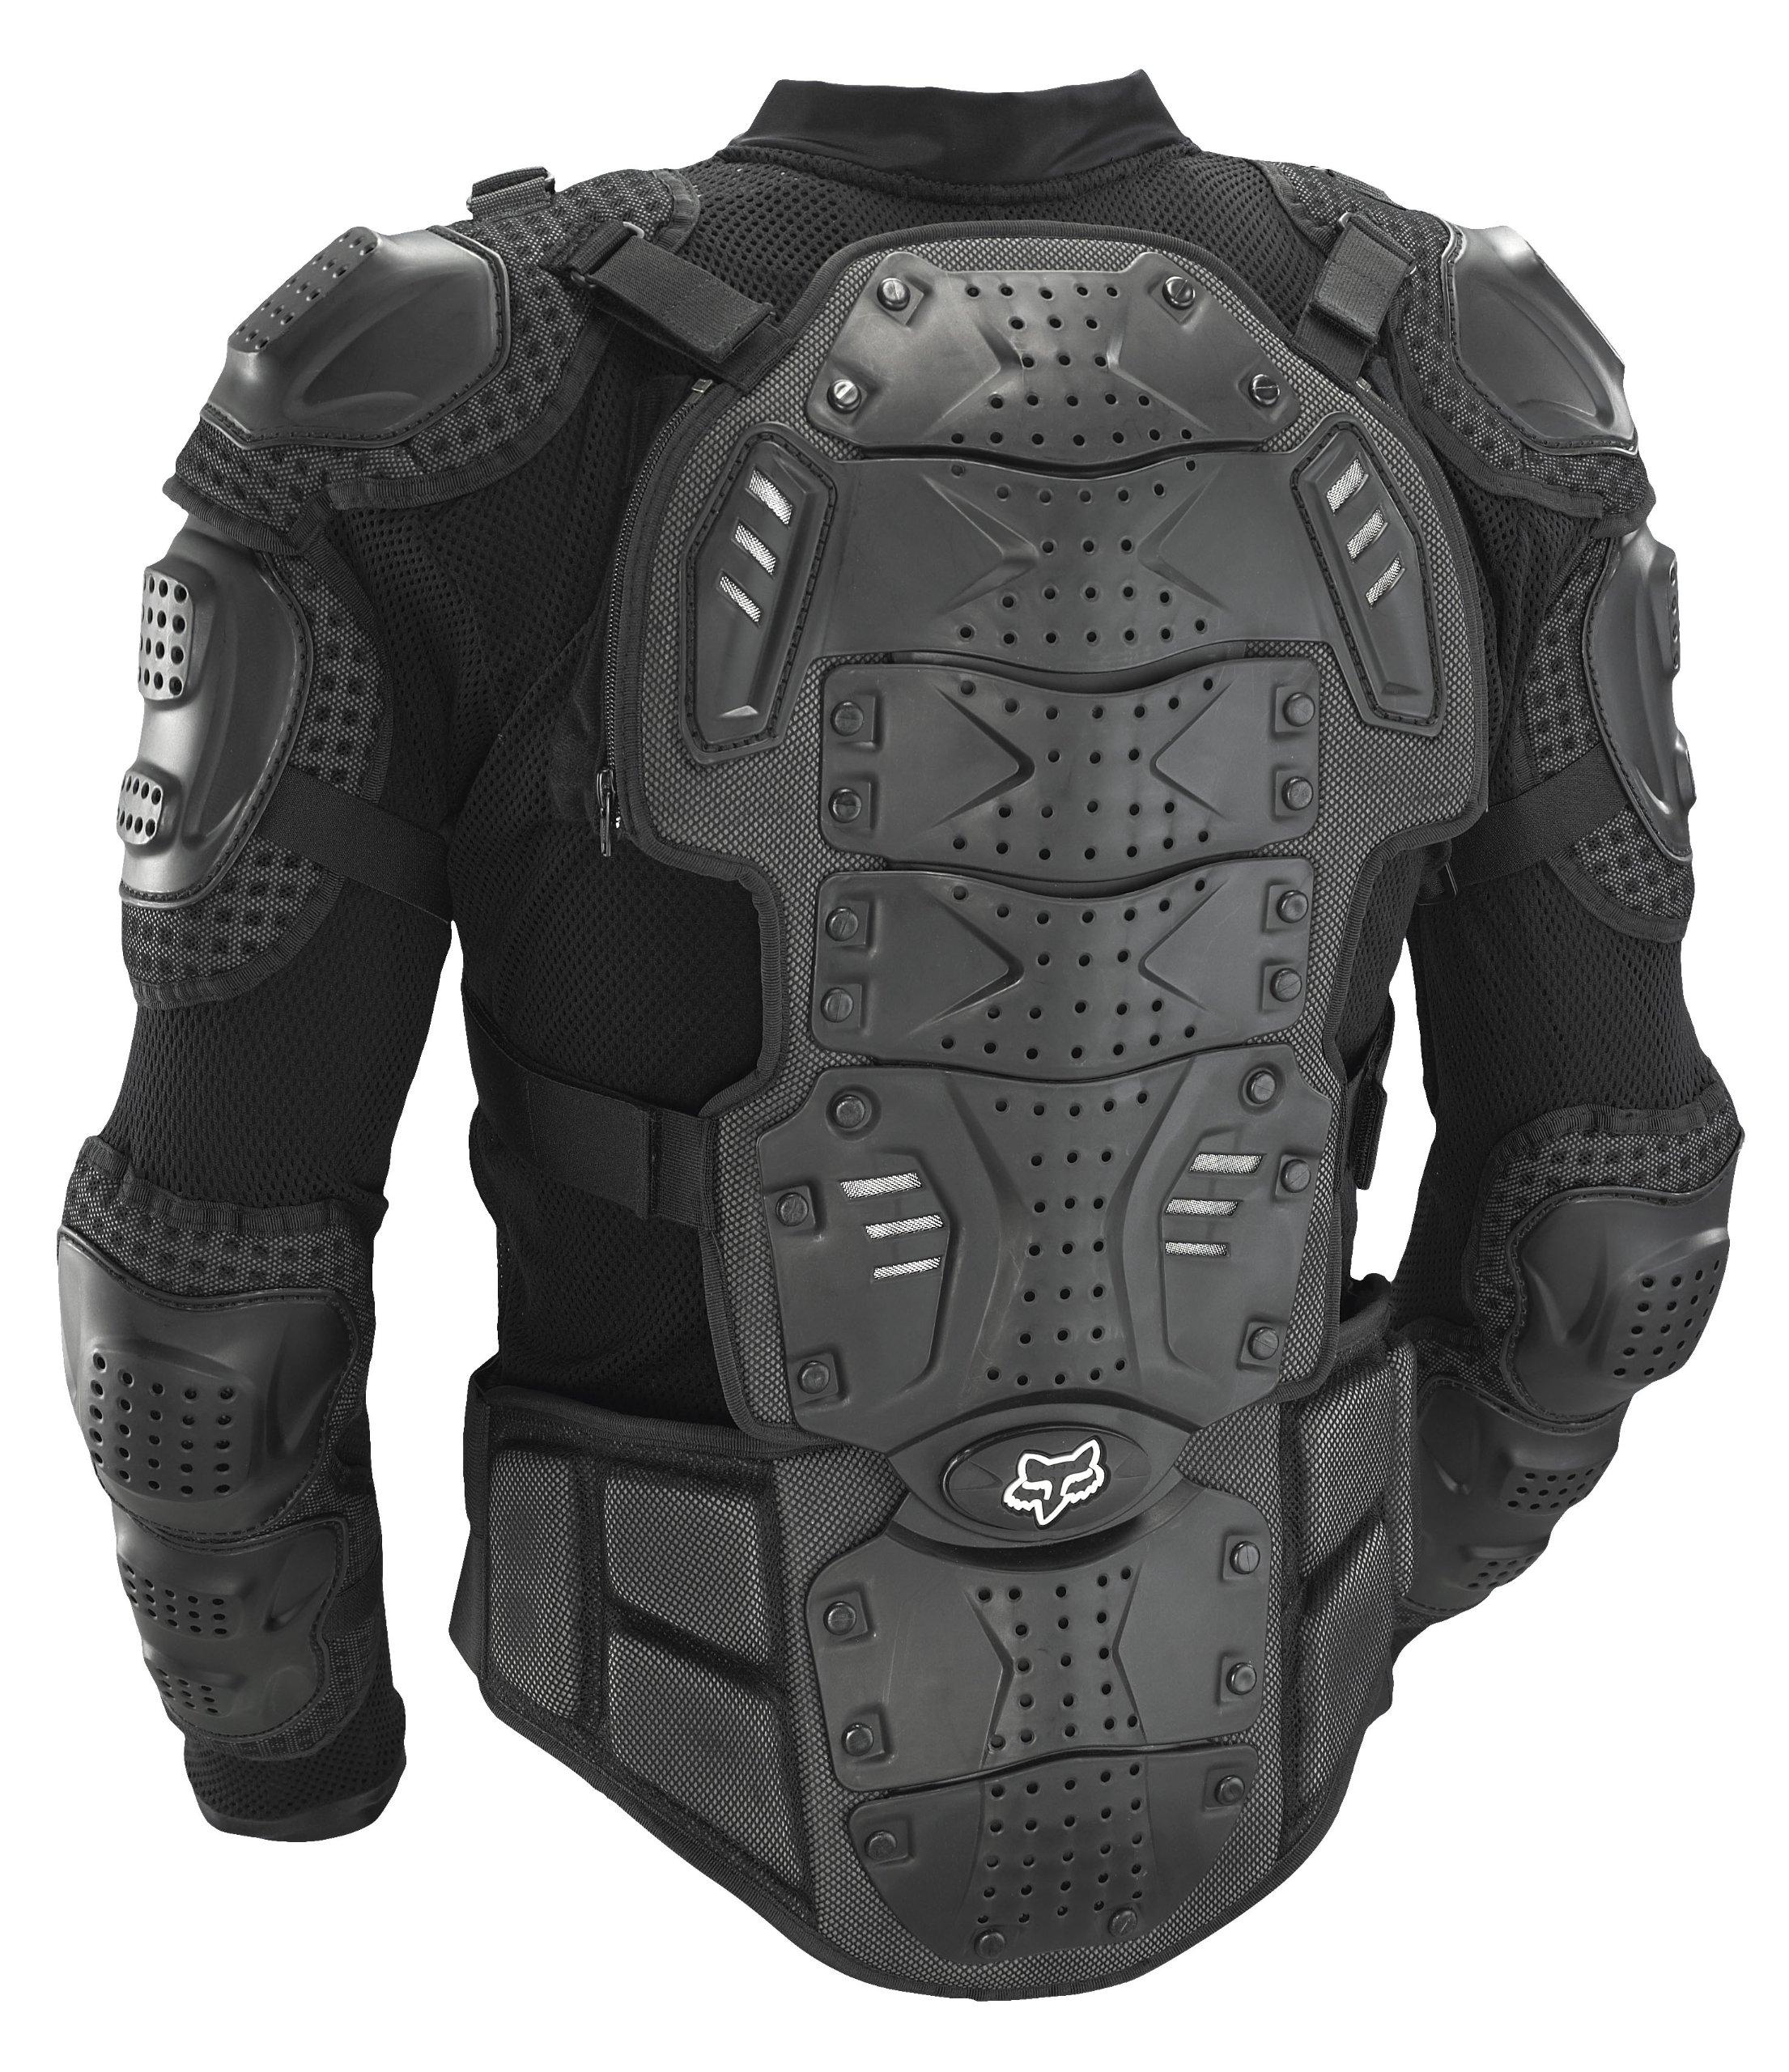 Fox Racing Titan Sport Protective MTB Jacket (Black, Large) by Fox Racing (Image #2)